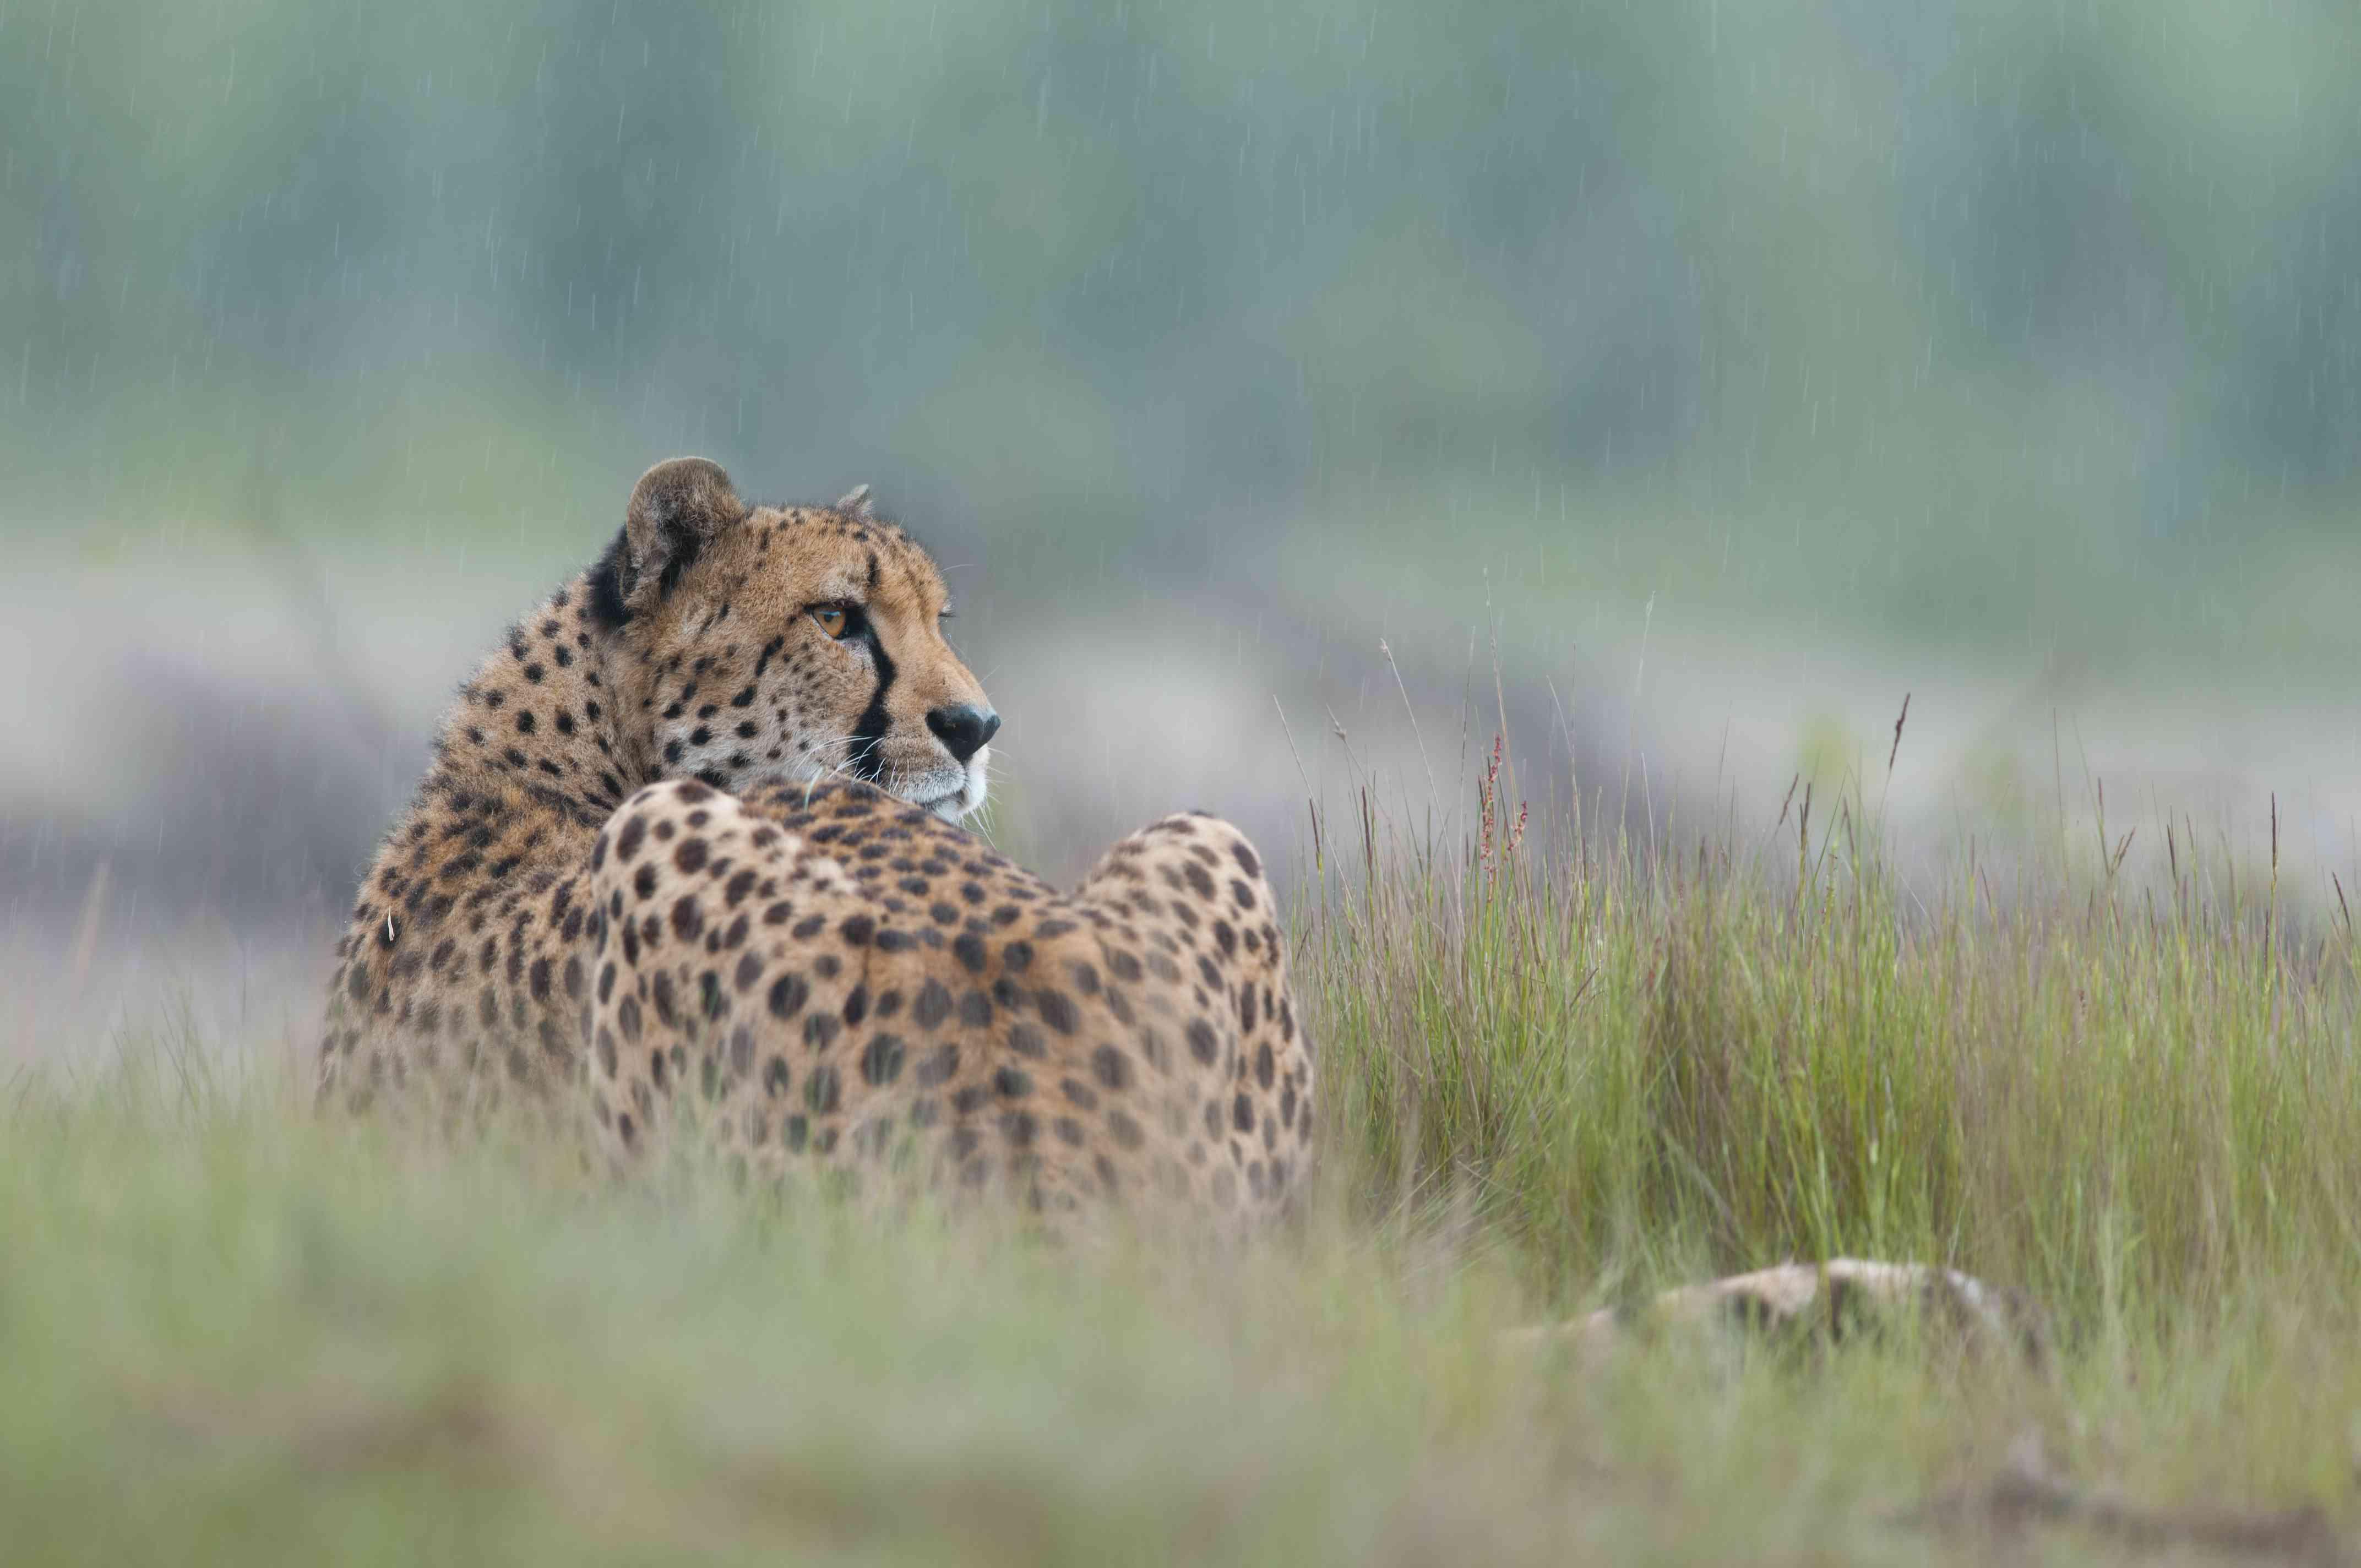 Cheetah lying down in grass, Safari Park Beekse Bergen, The Netherlands